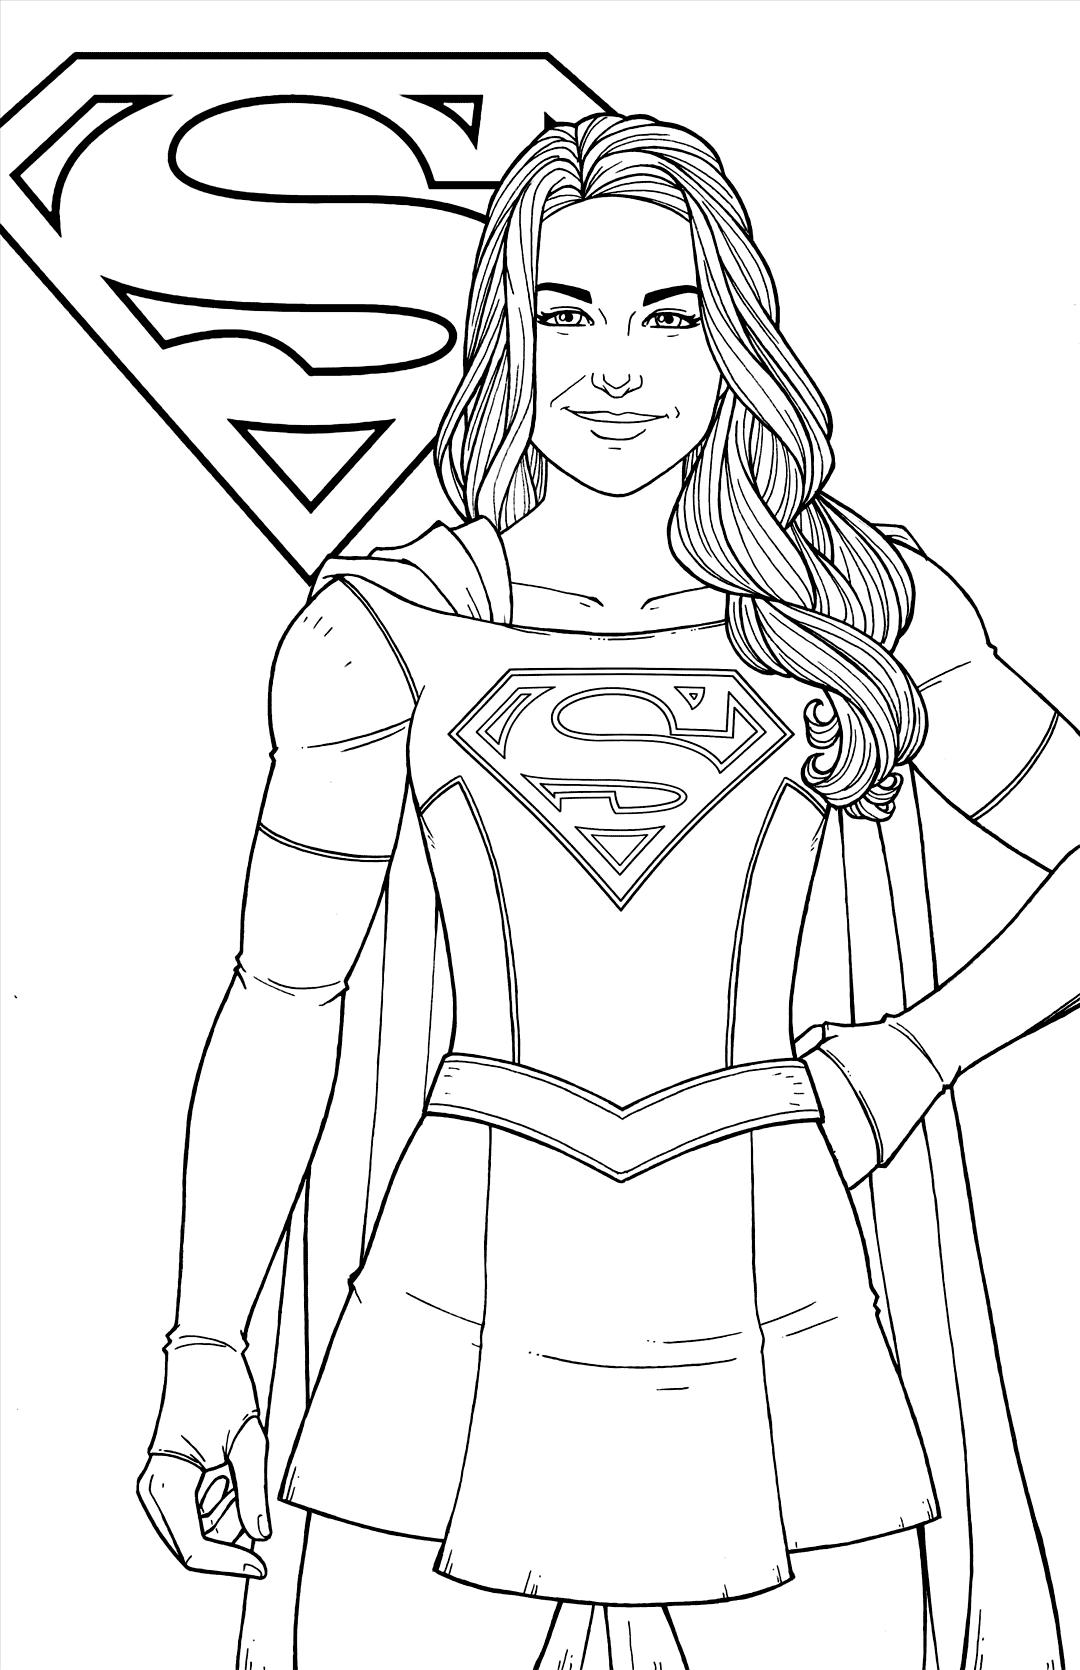 Supergirl Coloring Pages : supergirl, coloring, pages, Supergirl, Coloring, Pages, Coloring.rocks!